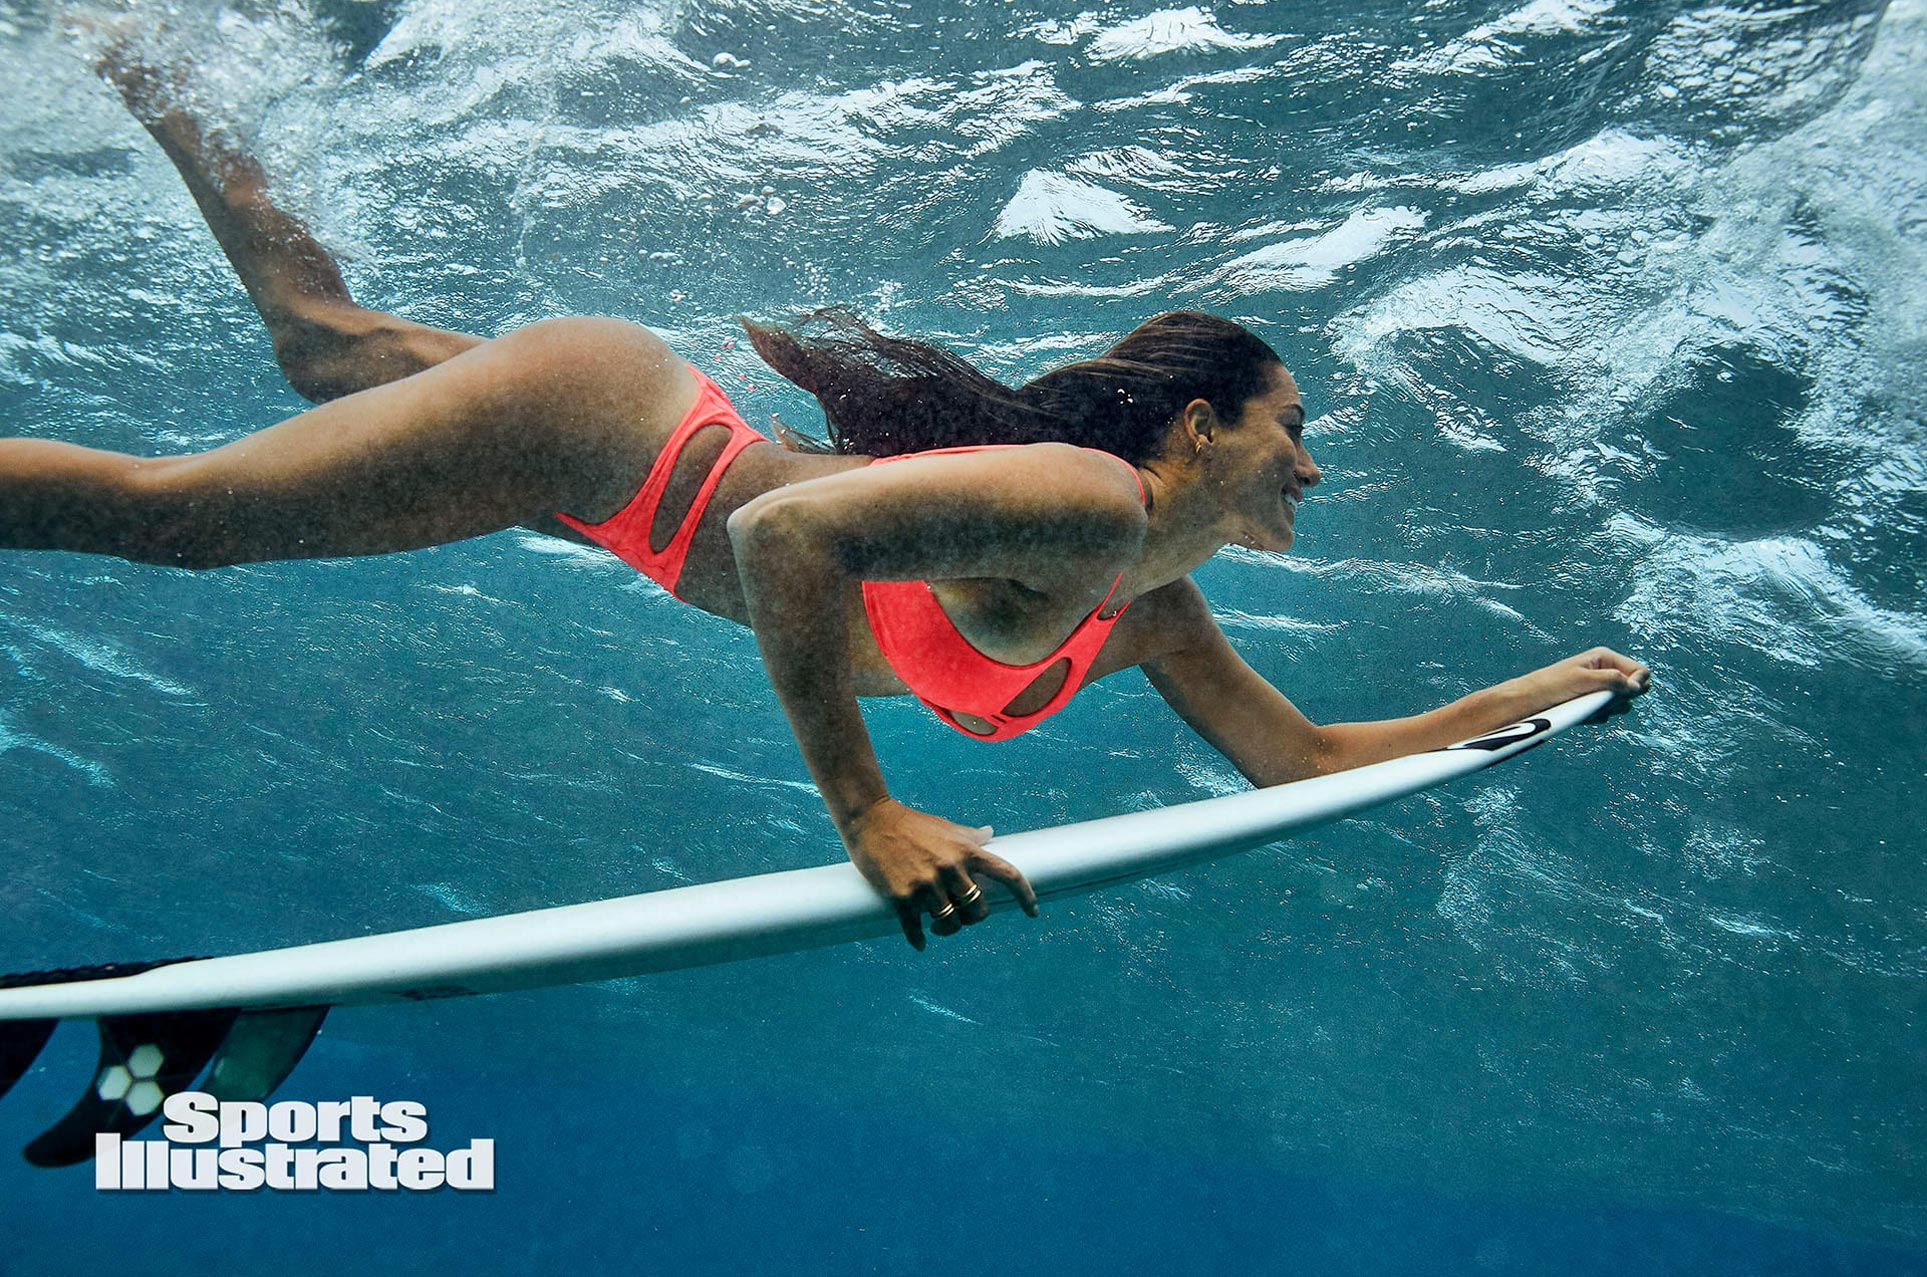 Малия Мануэль в каталоге купальников Sports Illustrated Swimsuit 2020 / фото 05